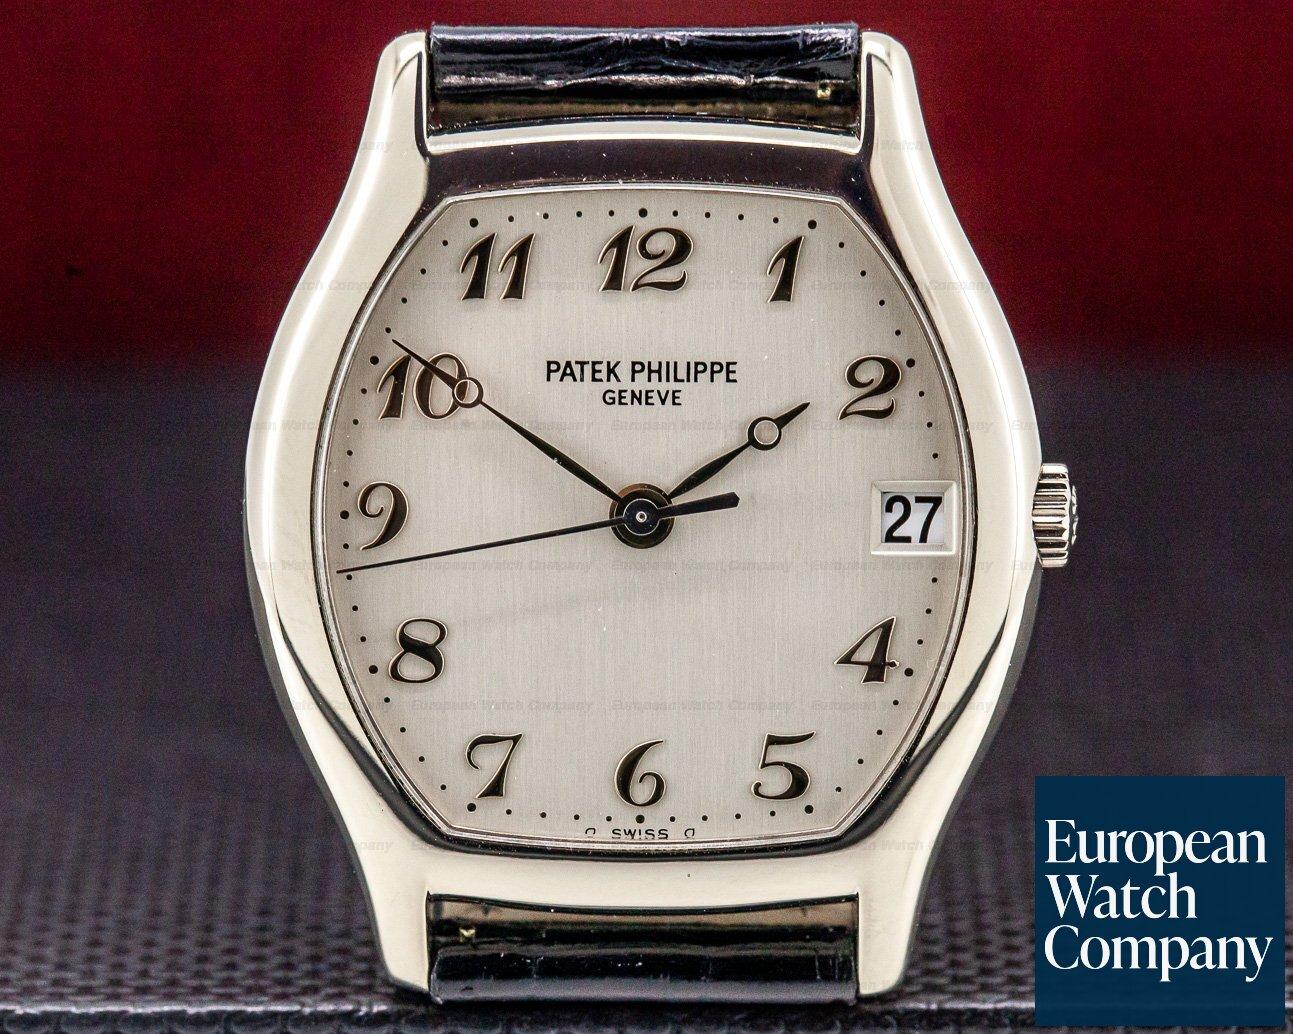 Patek Philippe 5030G-001 Gondolo Tonneau 18K White Gold / Breguet Numerals